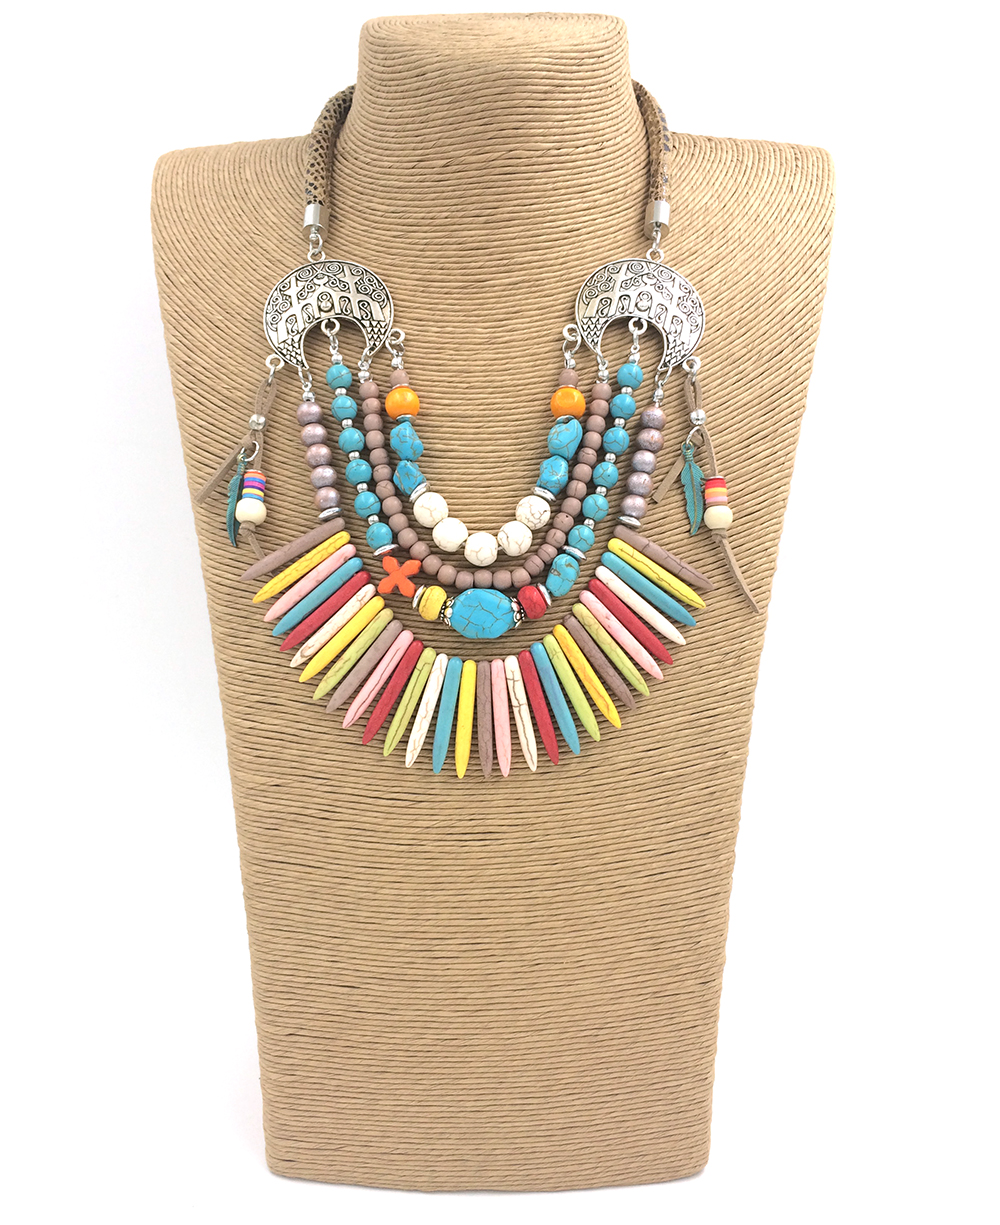 LIESKGON Big Acrylic Bead Personalized Necklace Women Bohemian Chain Choker Necklaces /& Pendants